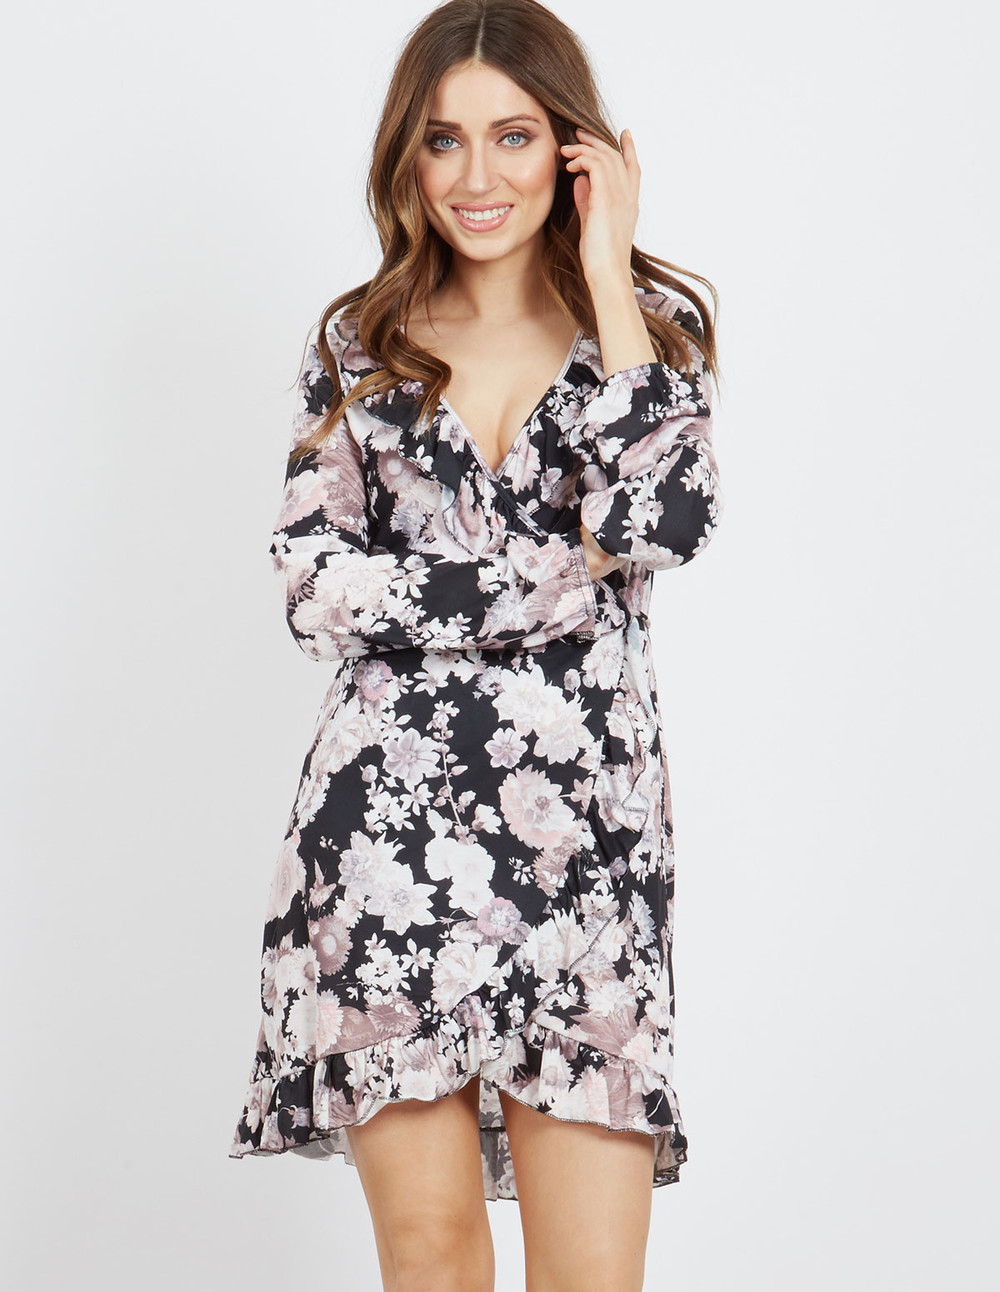 Blue Vanilla KESSA - Floral Wrap Dress in black